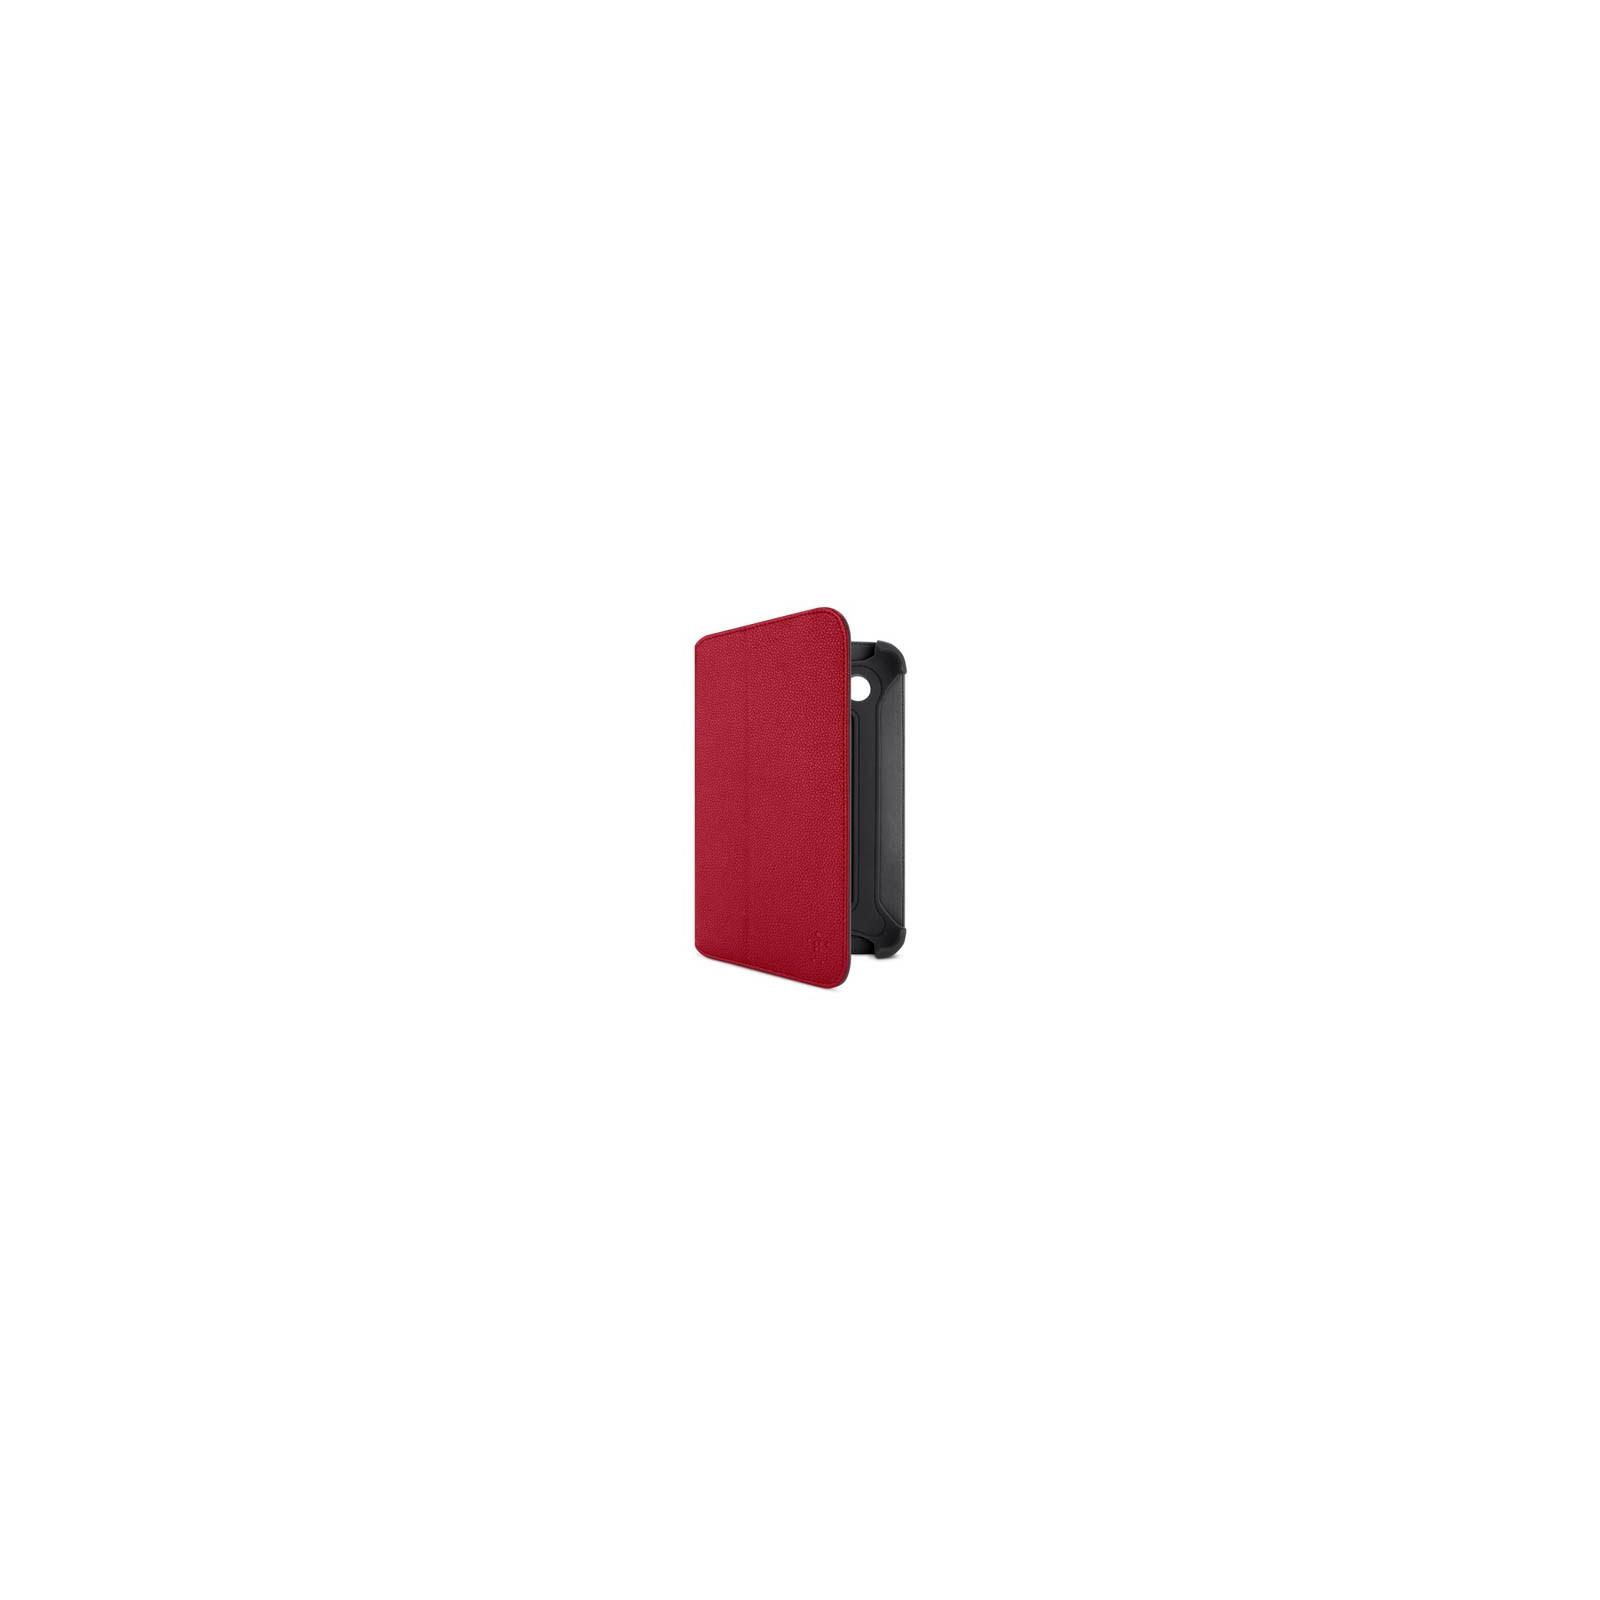 Чехол для планшета Belkin 7 Galaxy Tab2 Bi-Fold Folio Stand (F8M386cwC02)